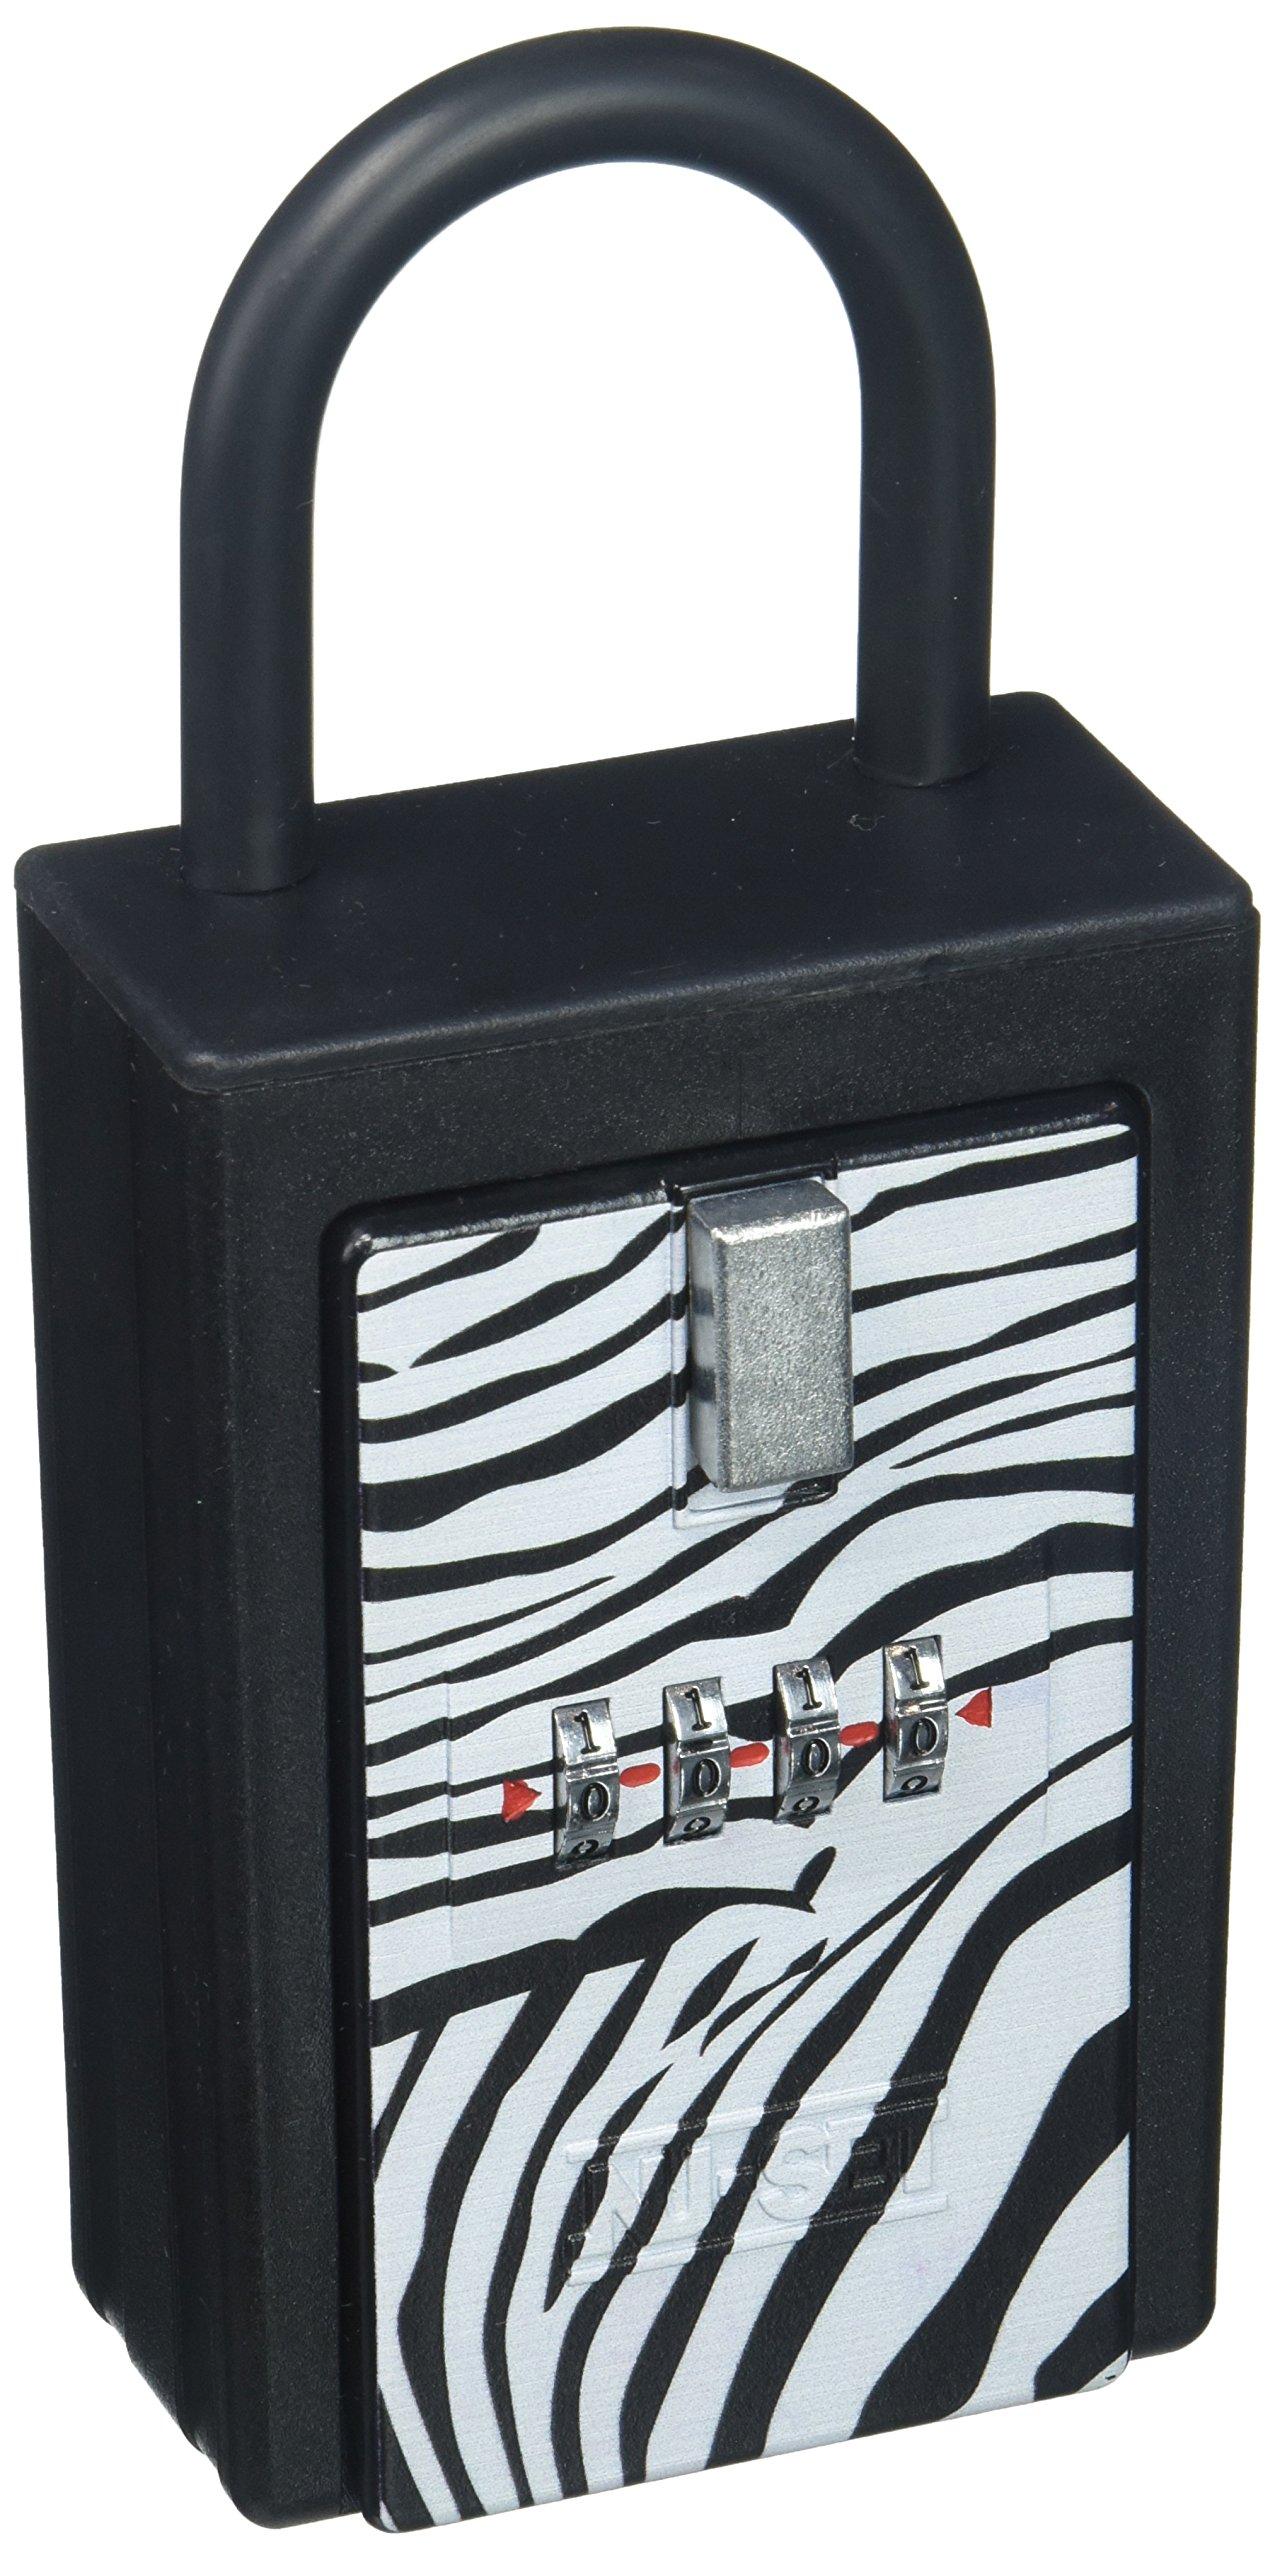 NU-Set 1004-3 Safari NuSet Safari 4 Digit Number Combination Key Card Storage Lockbox in Zebra Print (1004-3)…,